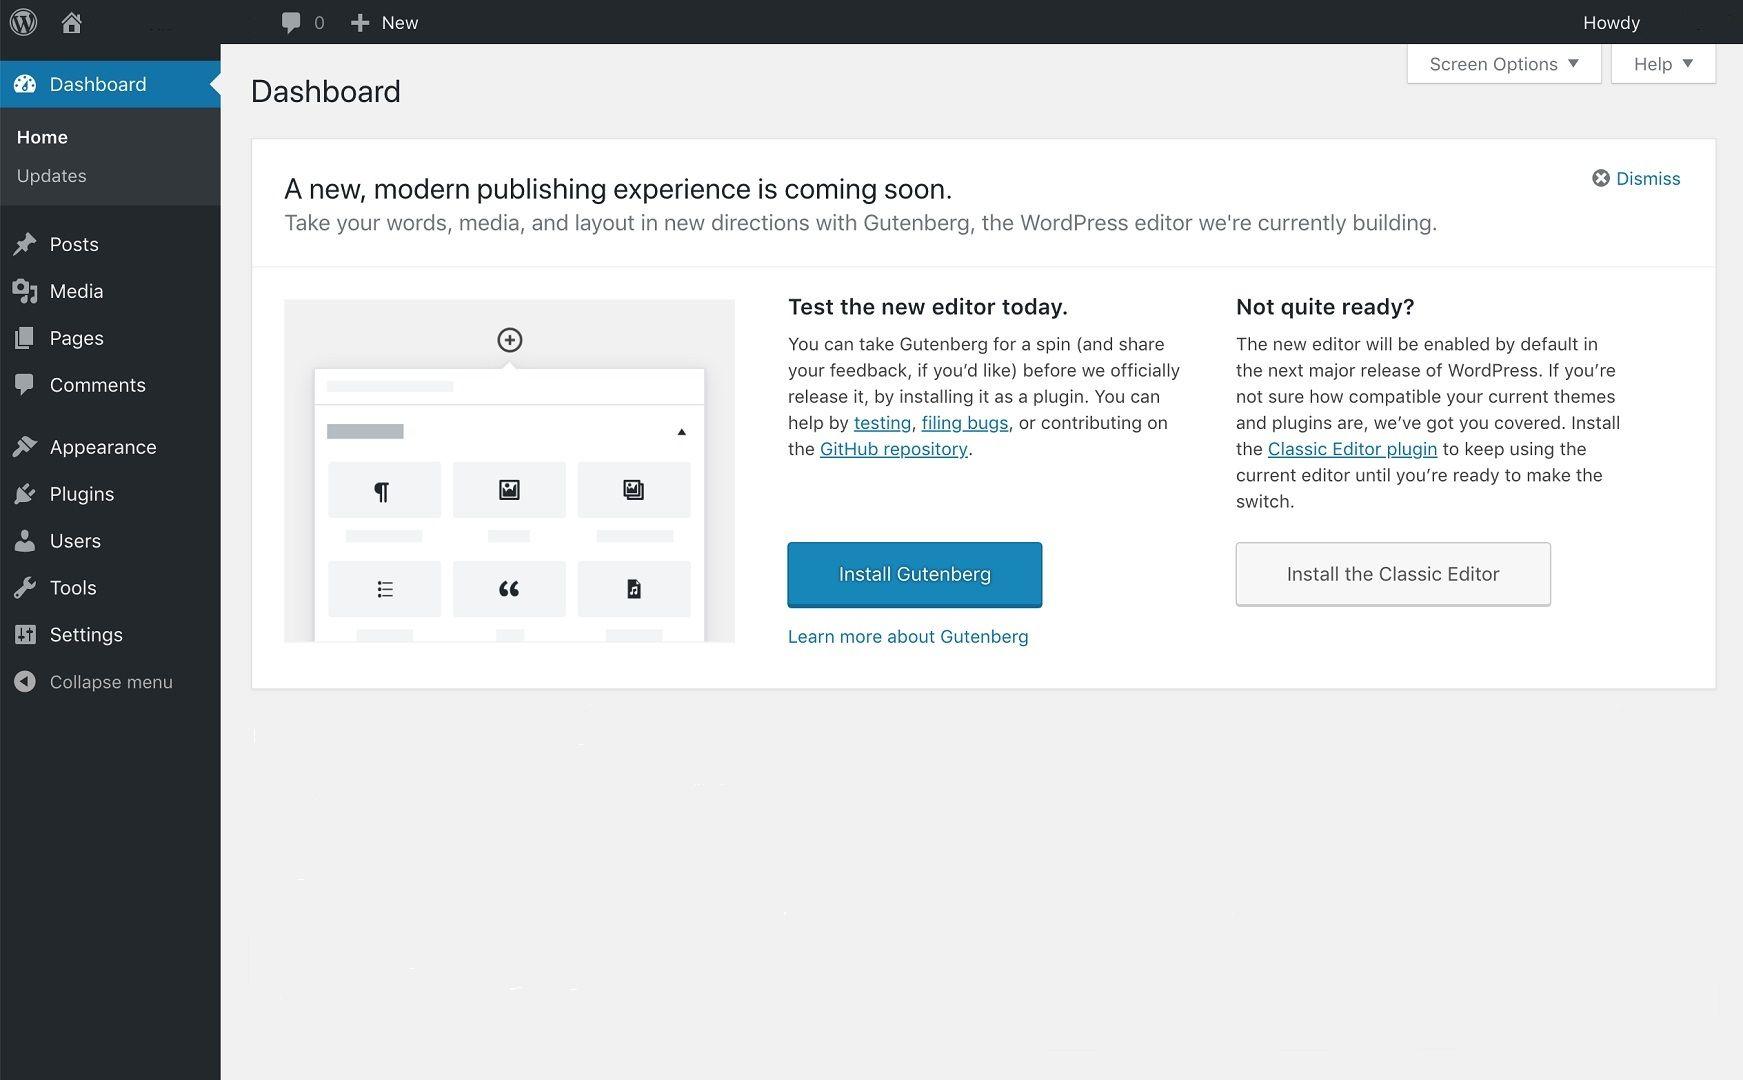 Dashboard Widget Enabled - Screenshot 1 of 4